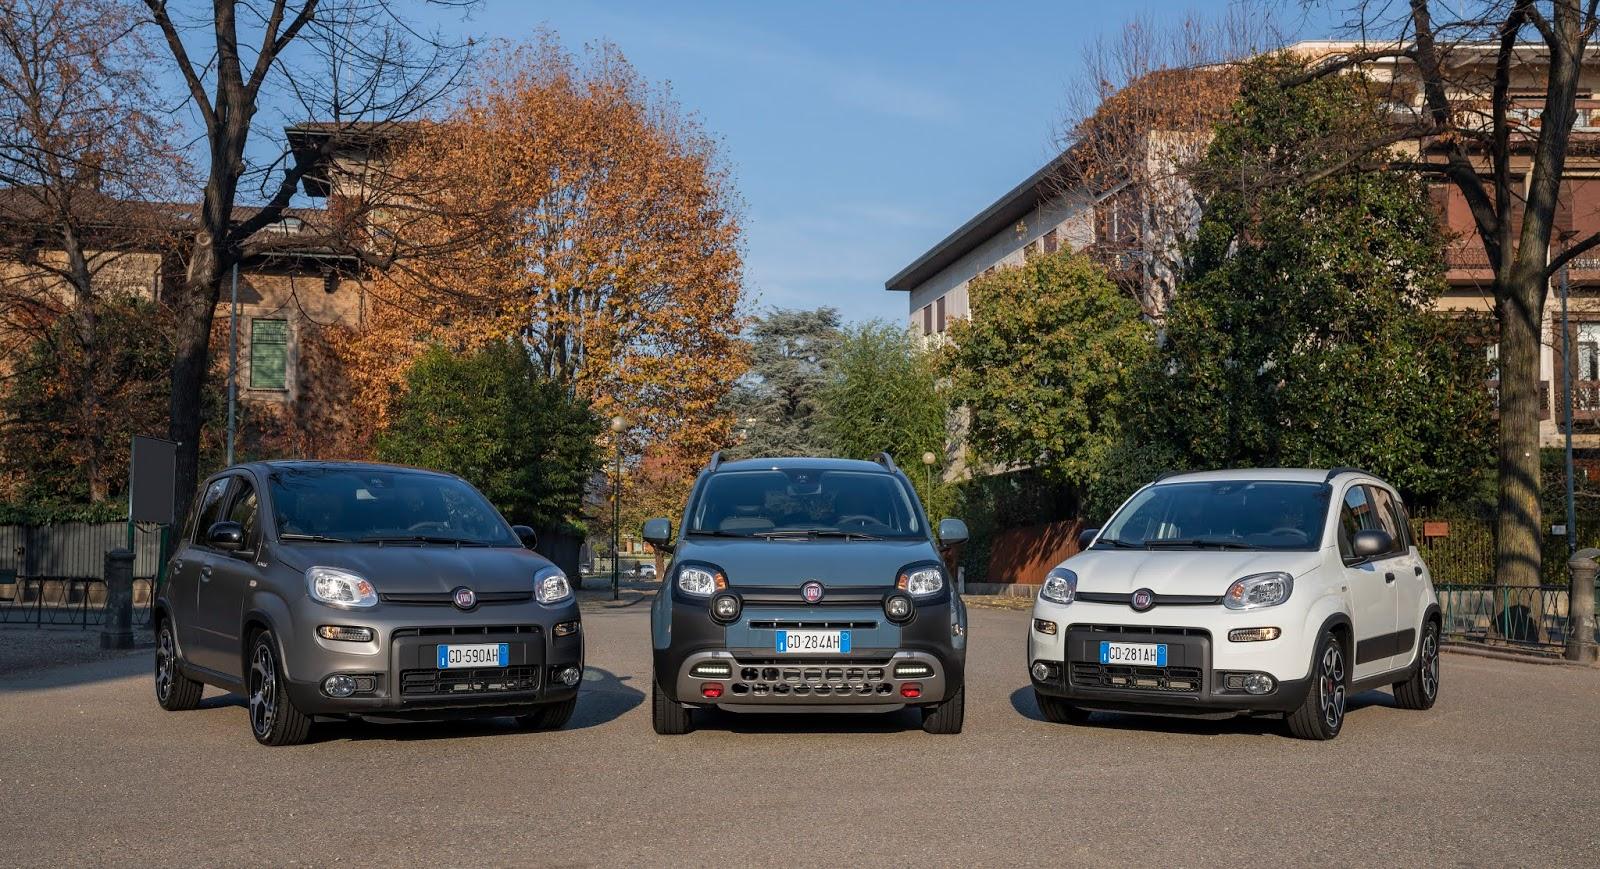 04 New2BPanda2Bline up Η Fiat ανανέωσε τα Panda και Tipo Fiat, Fiat Panda, Fiat Tipo, Panda, Tipo, zblog, ειδήσεις